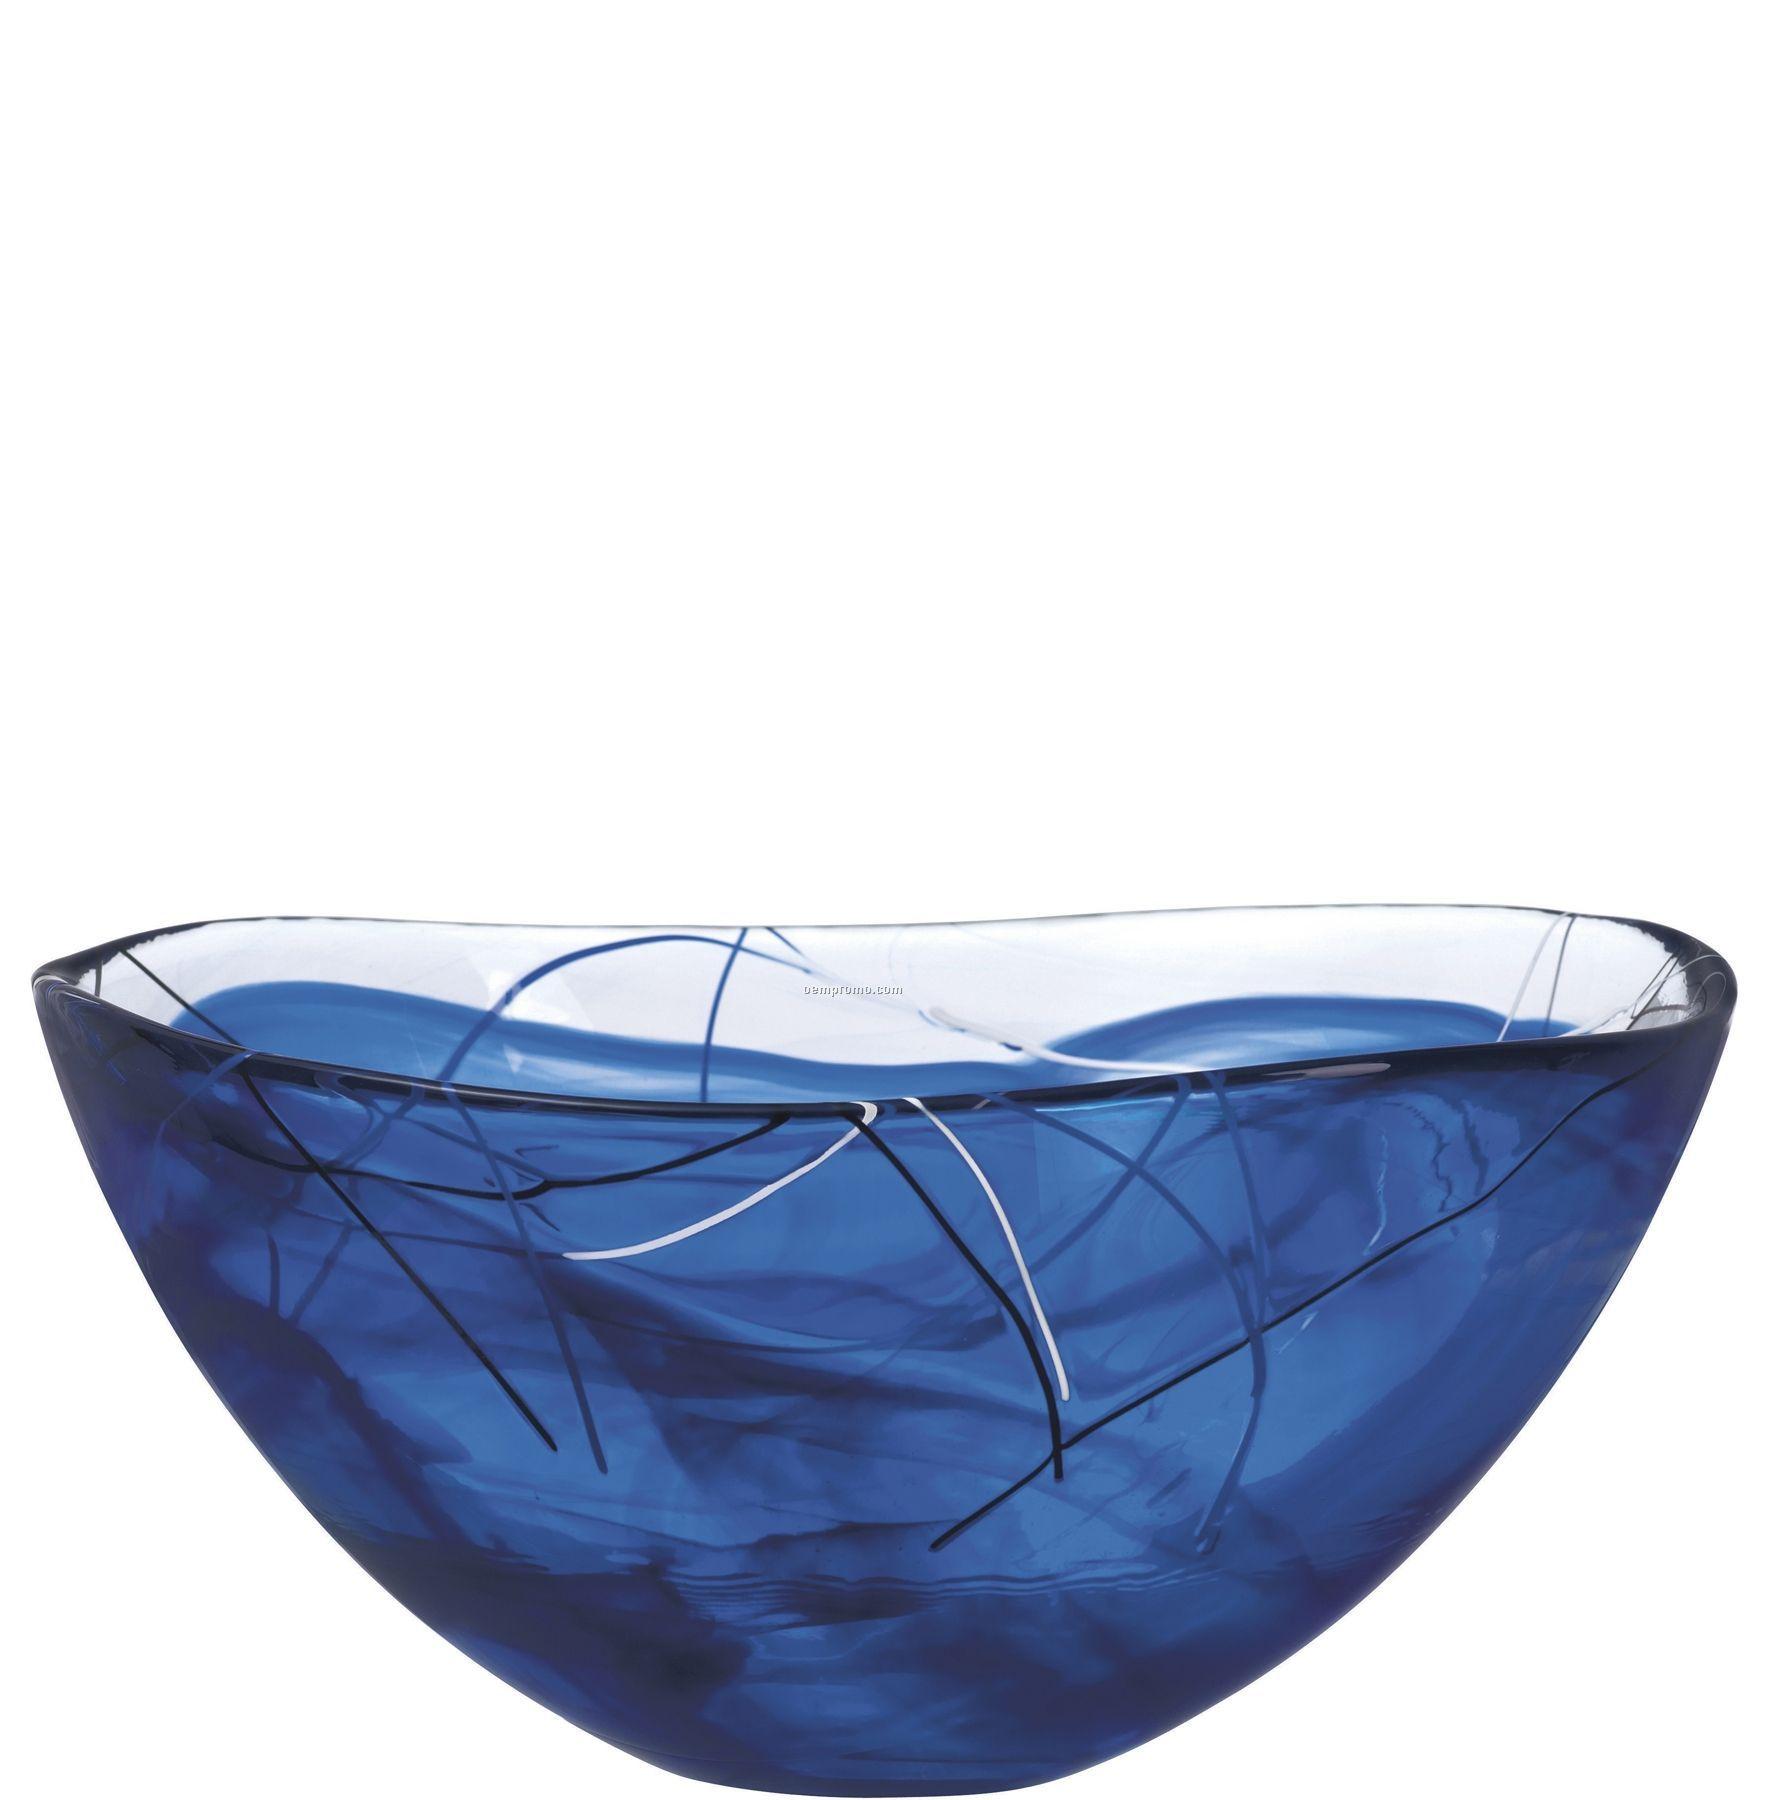 Contrast Large Swirl Crystal Bowl By Anna Ehrner (Blue)